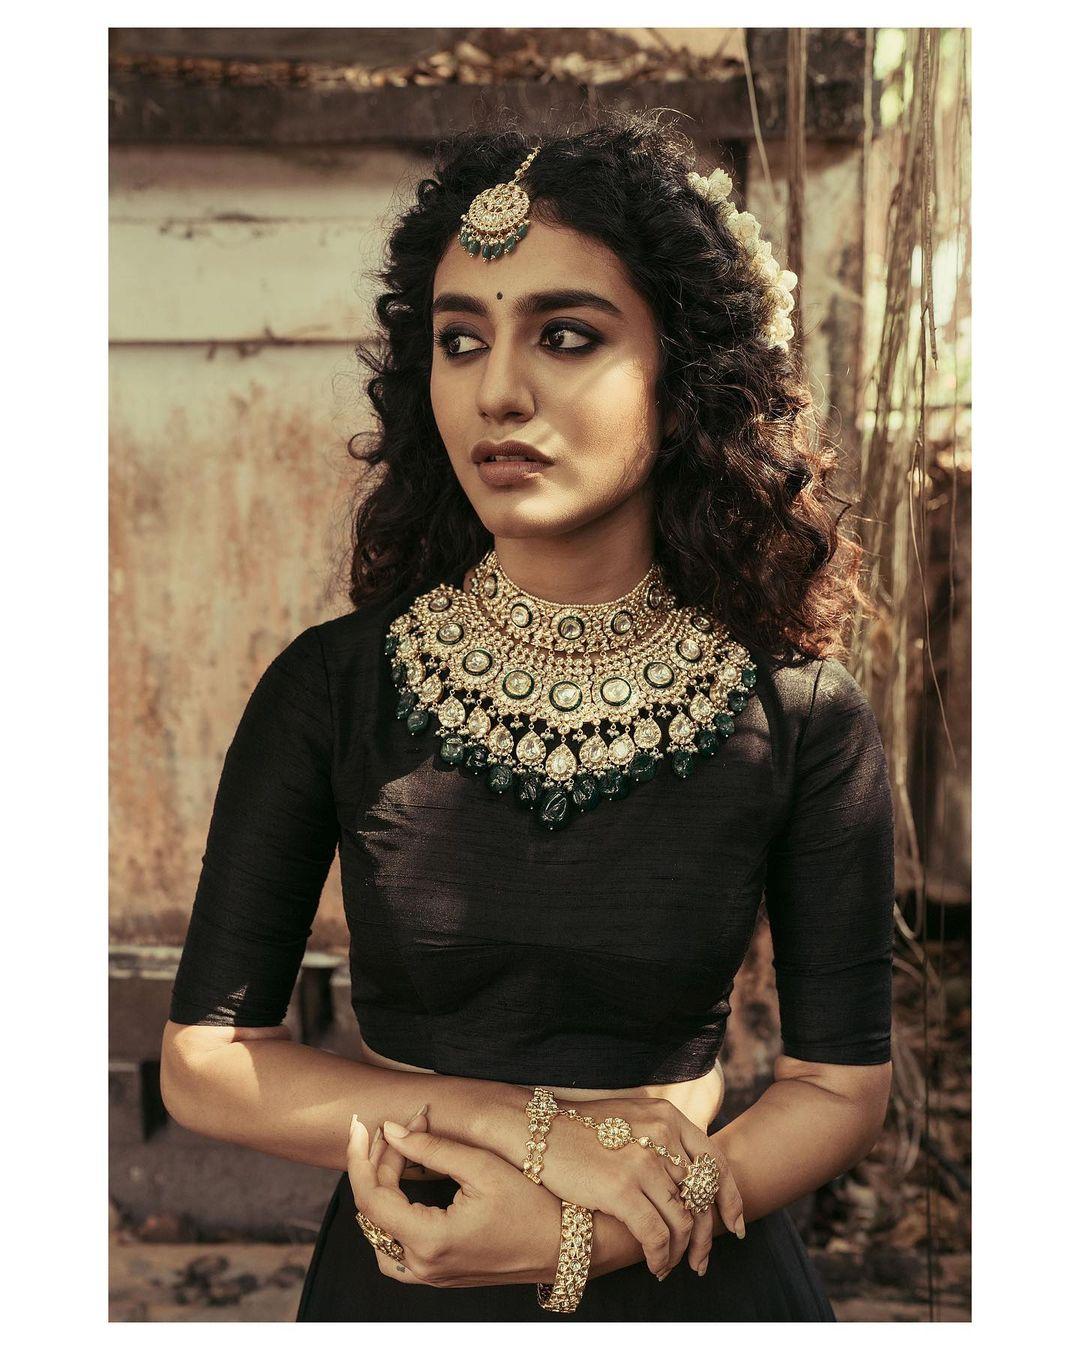 Wink Girl Priya Prakash